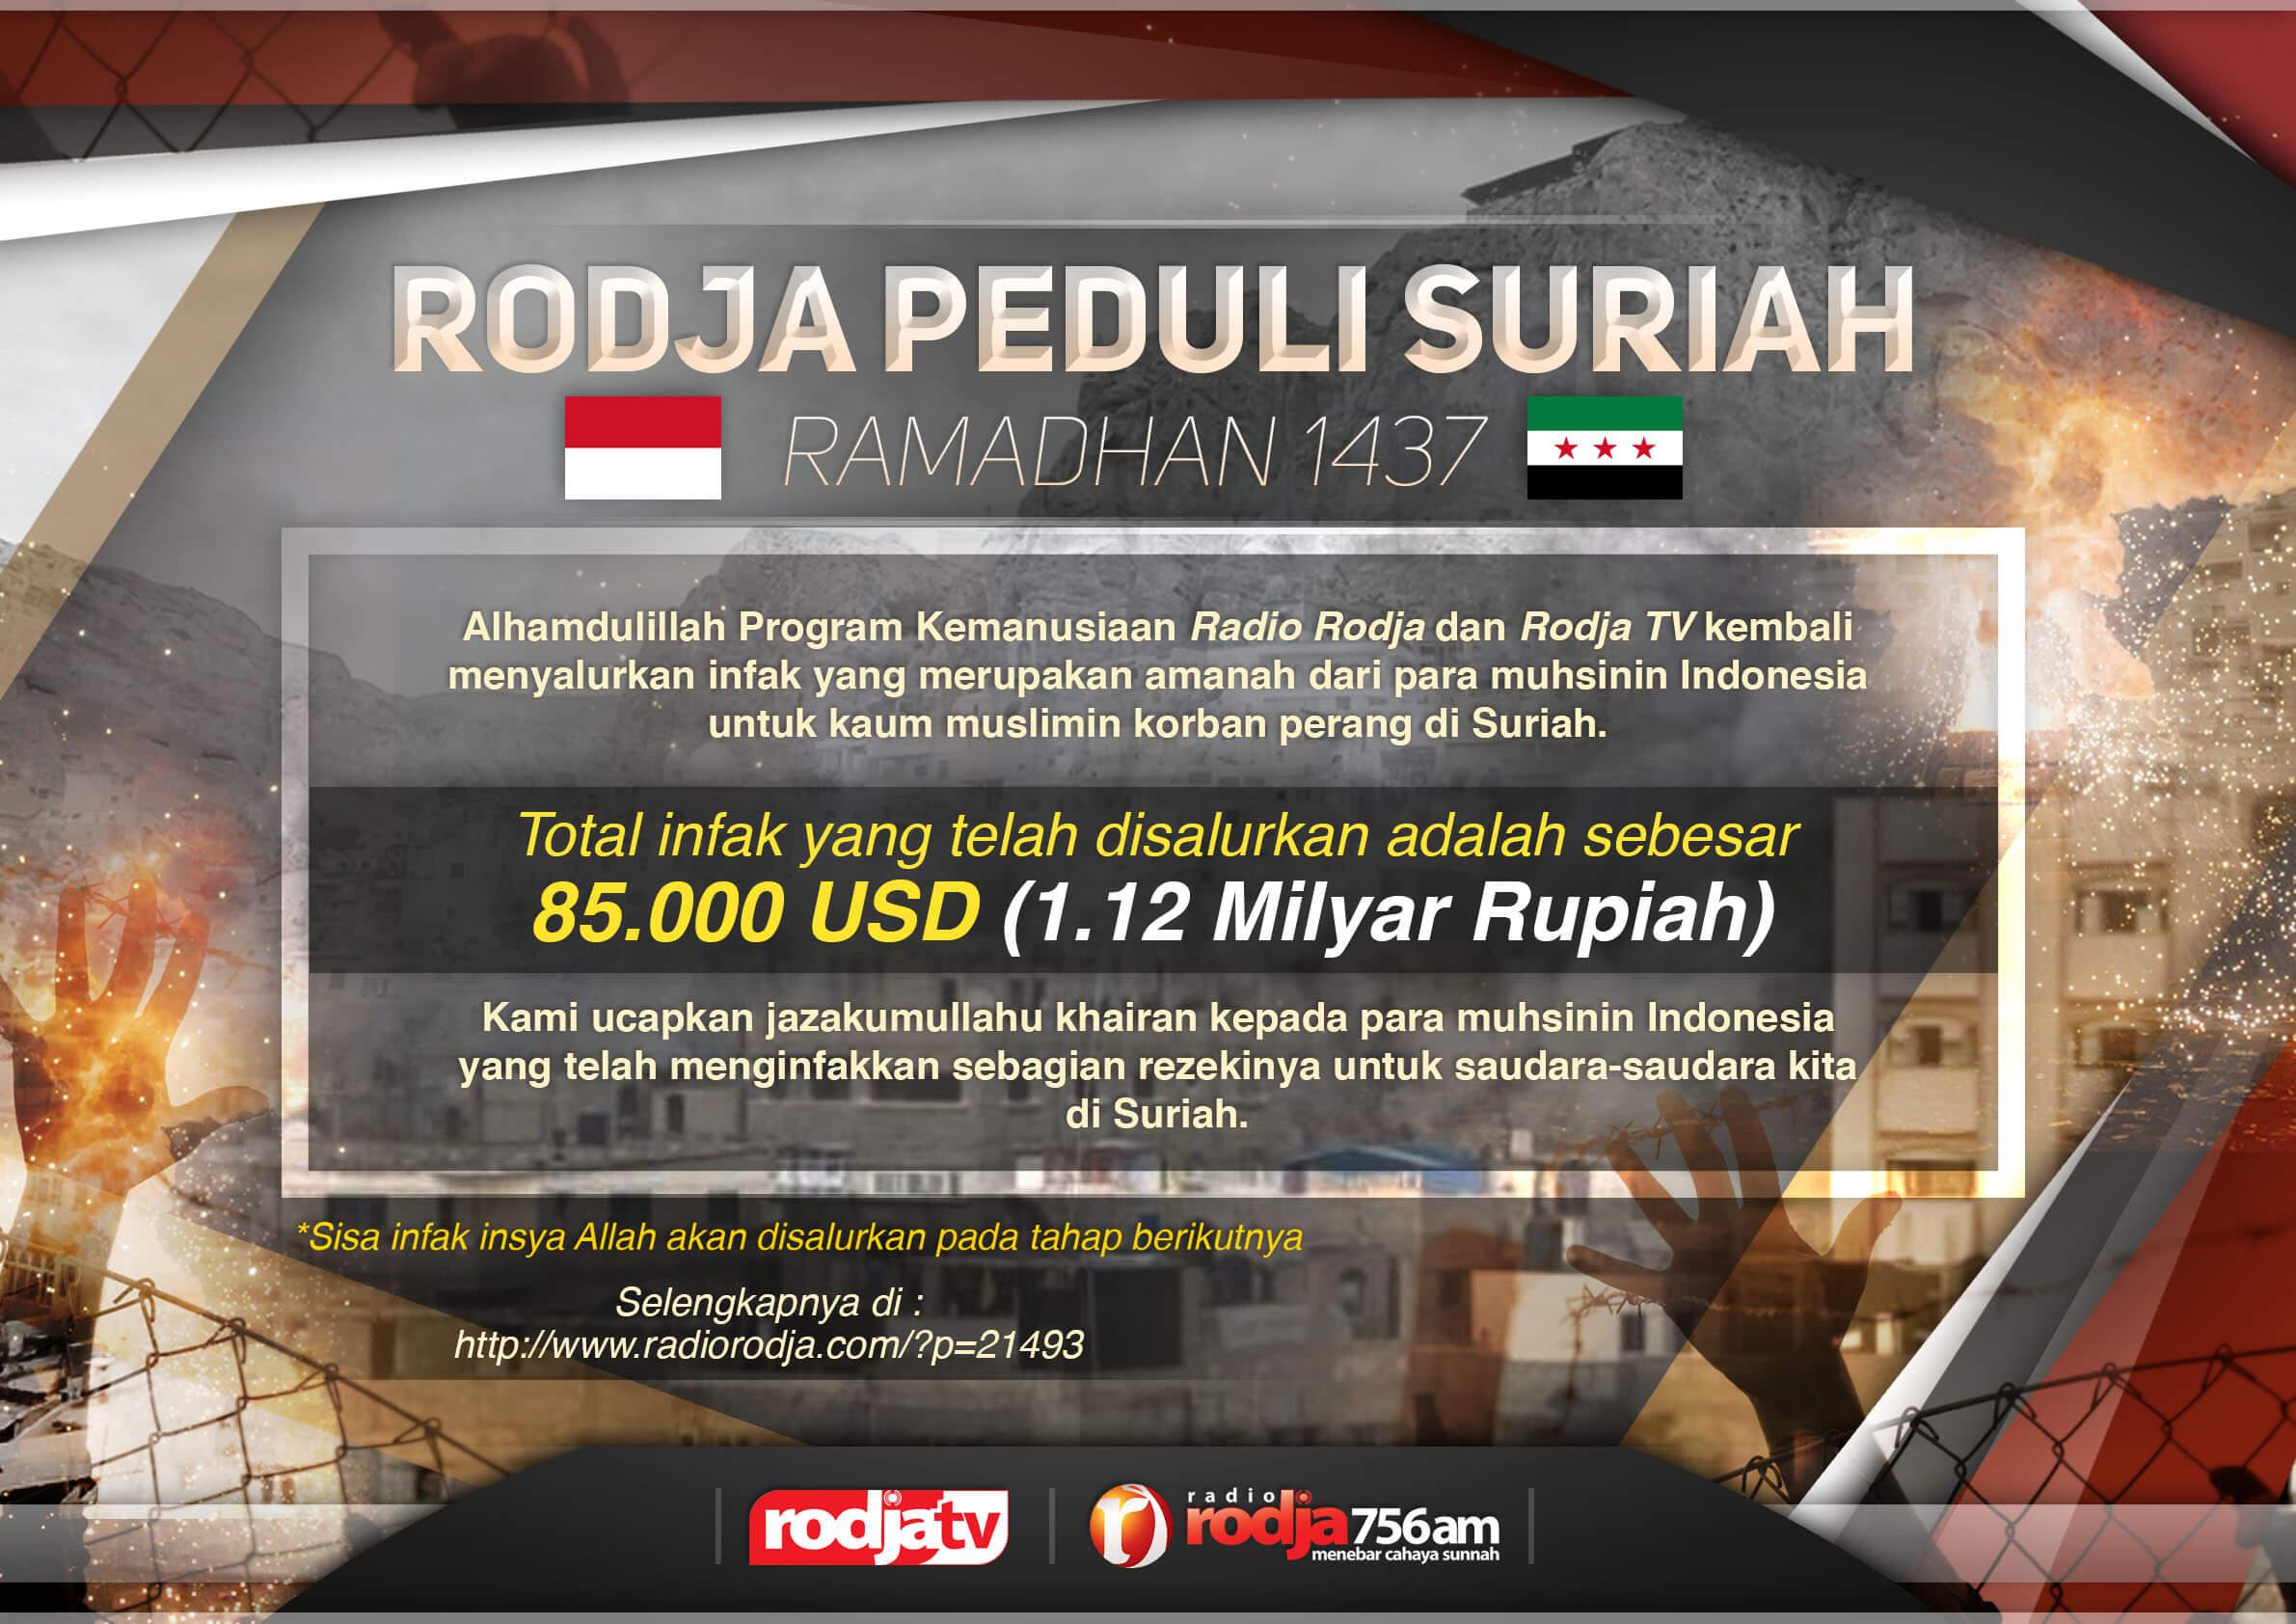 Poster Rodja Peduli Suriah - Ramadhan 1437